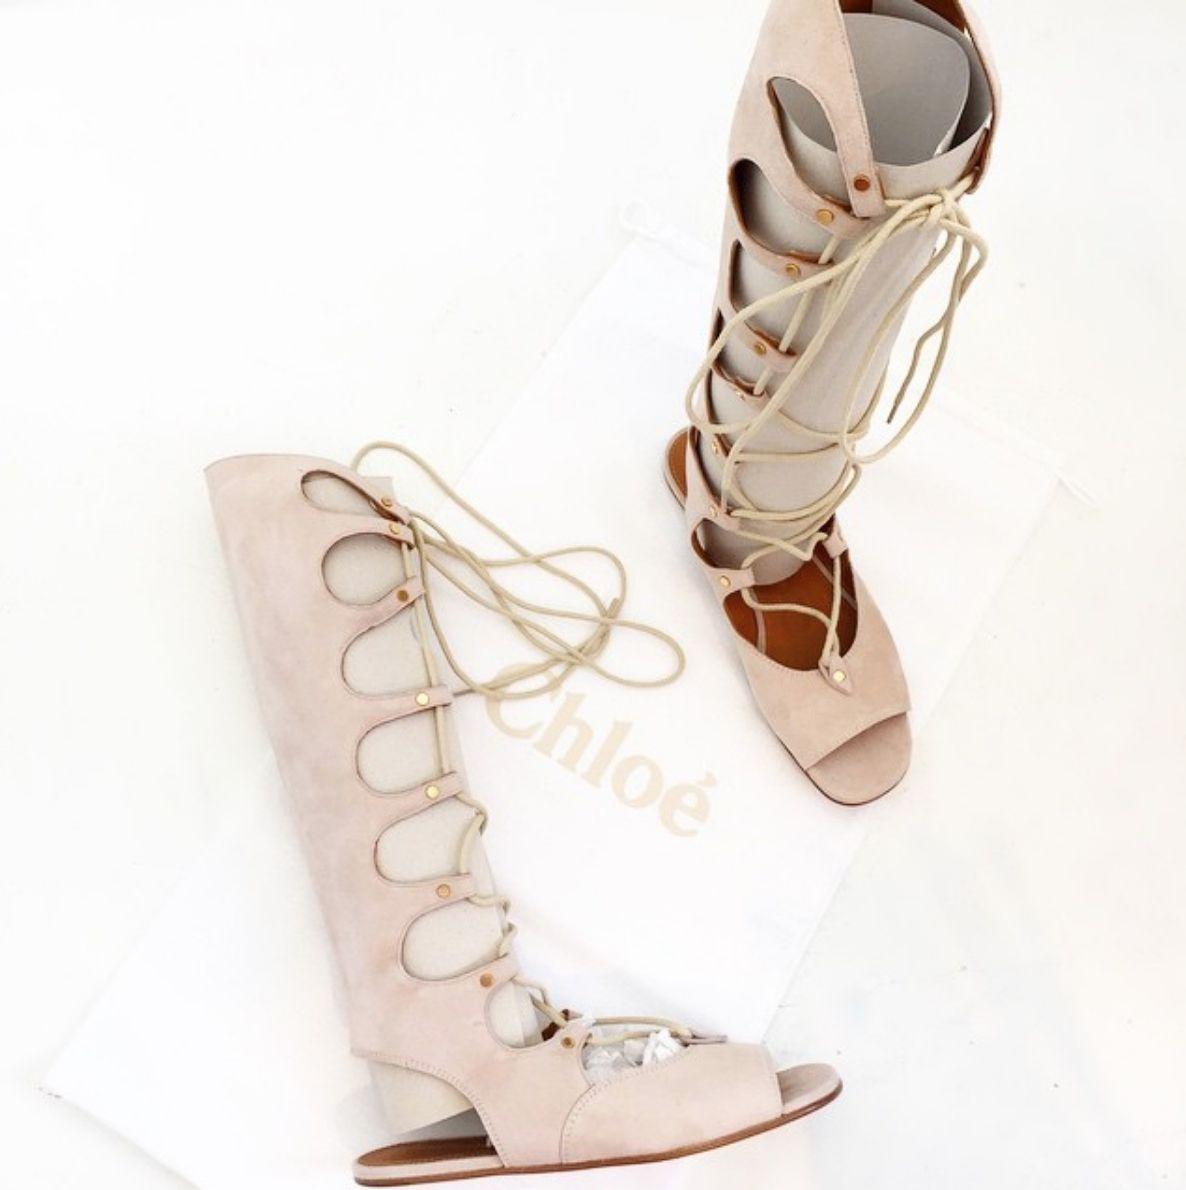 1a67597fd3f1 Chloe Cream Puff (light beige) suede lace-up tall gladiator sandals. Worn